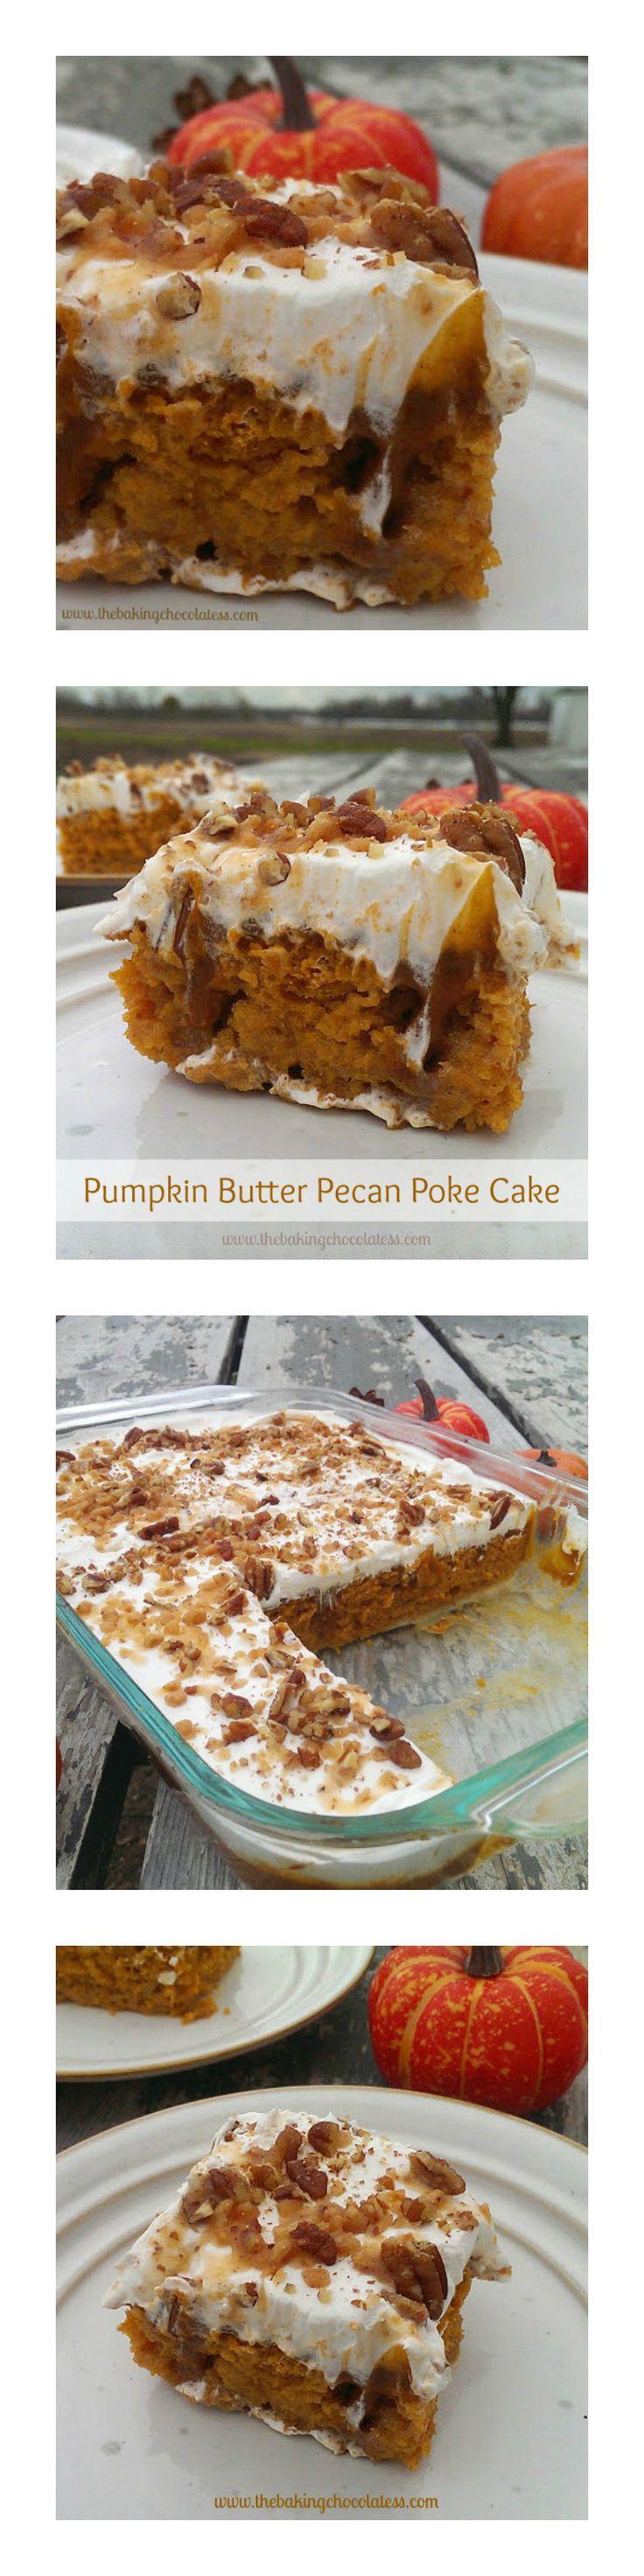 Pumpkin Butter Pecan Poke Cake – The Baking ChocolaTess